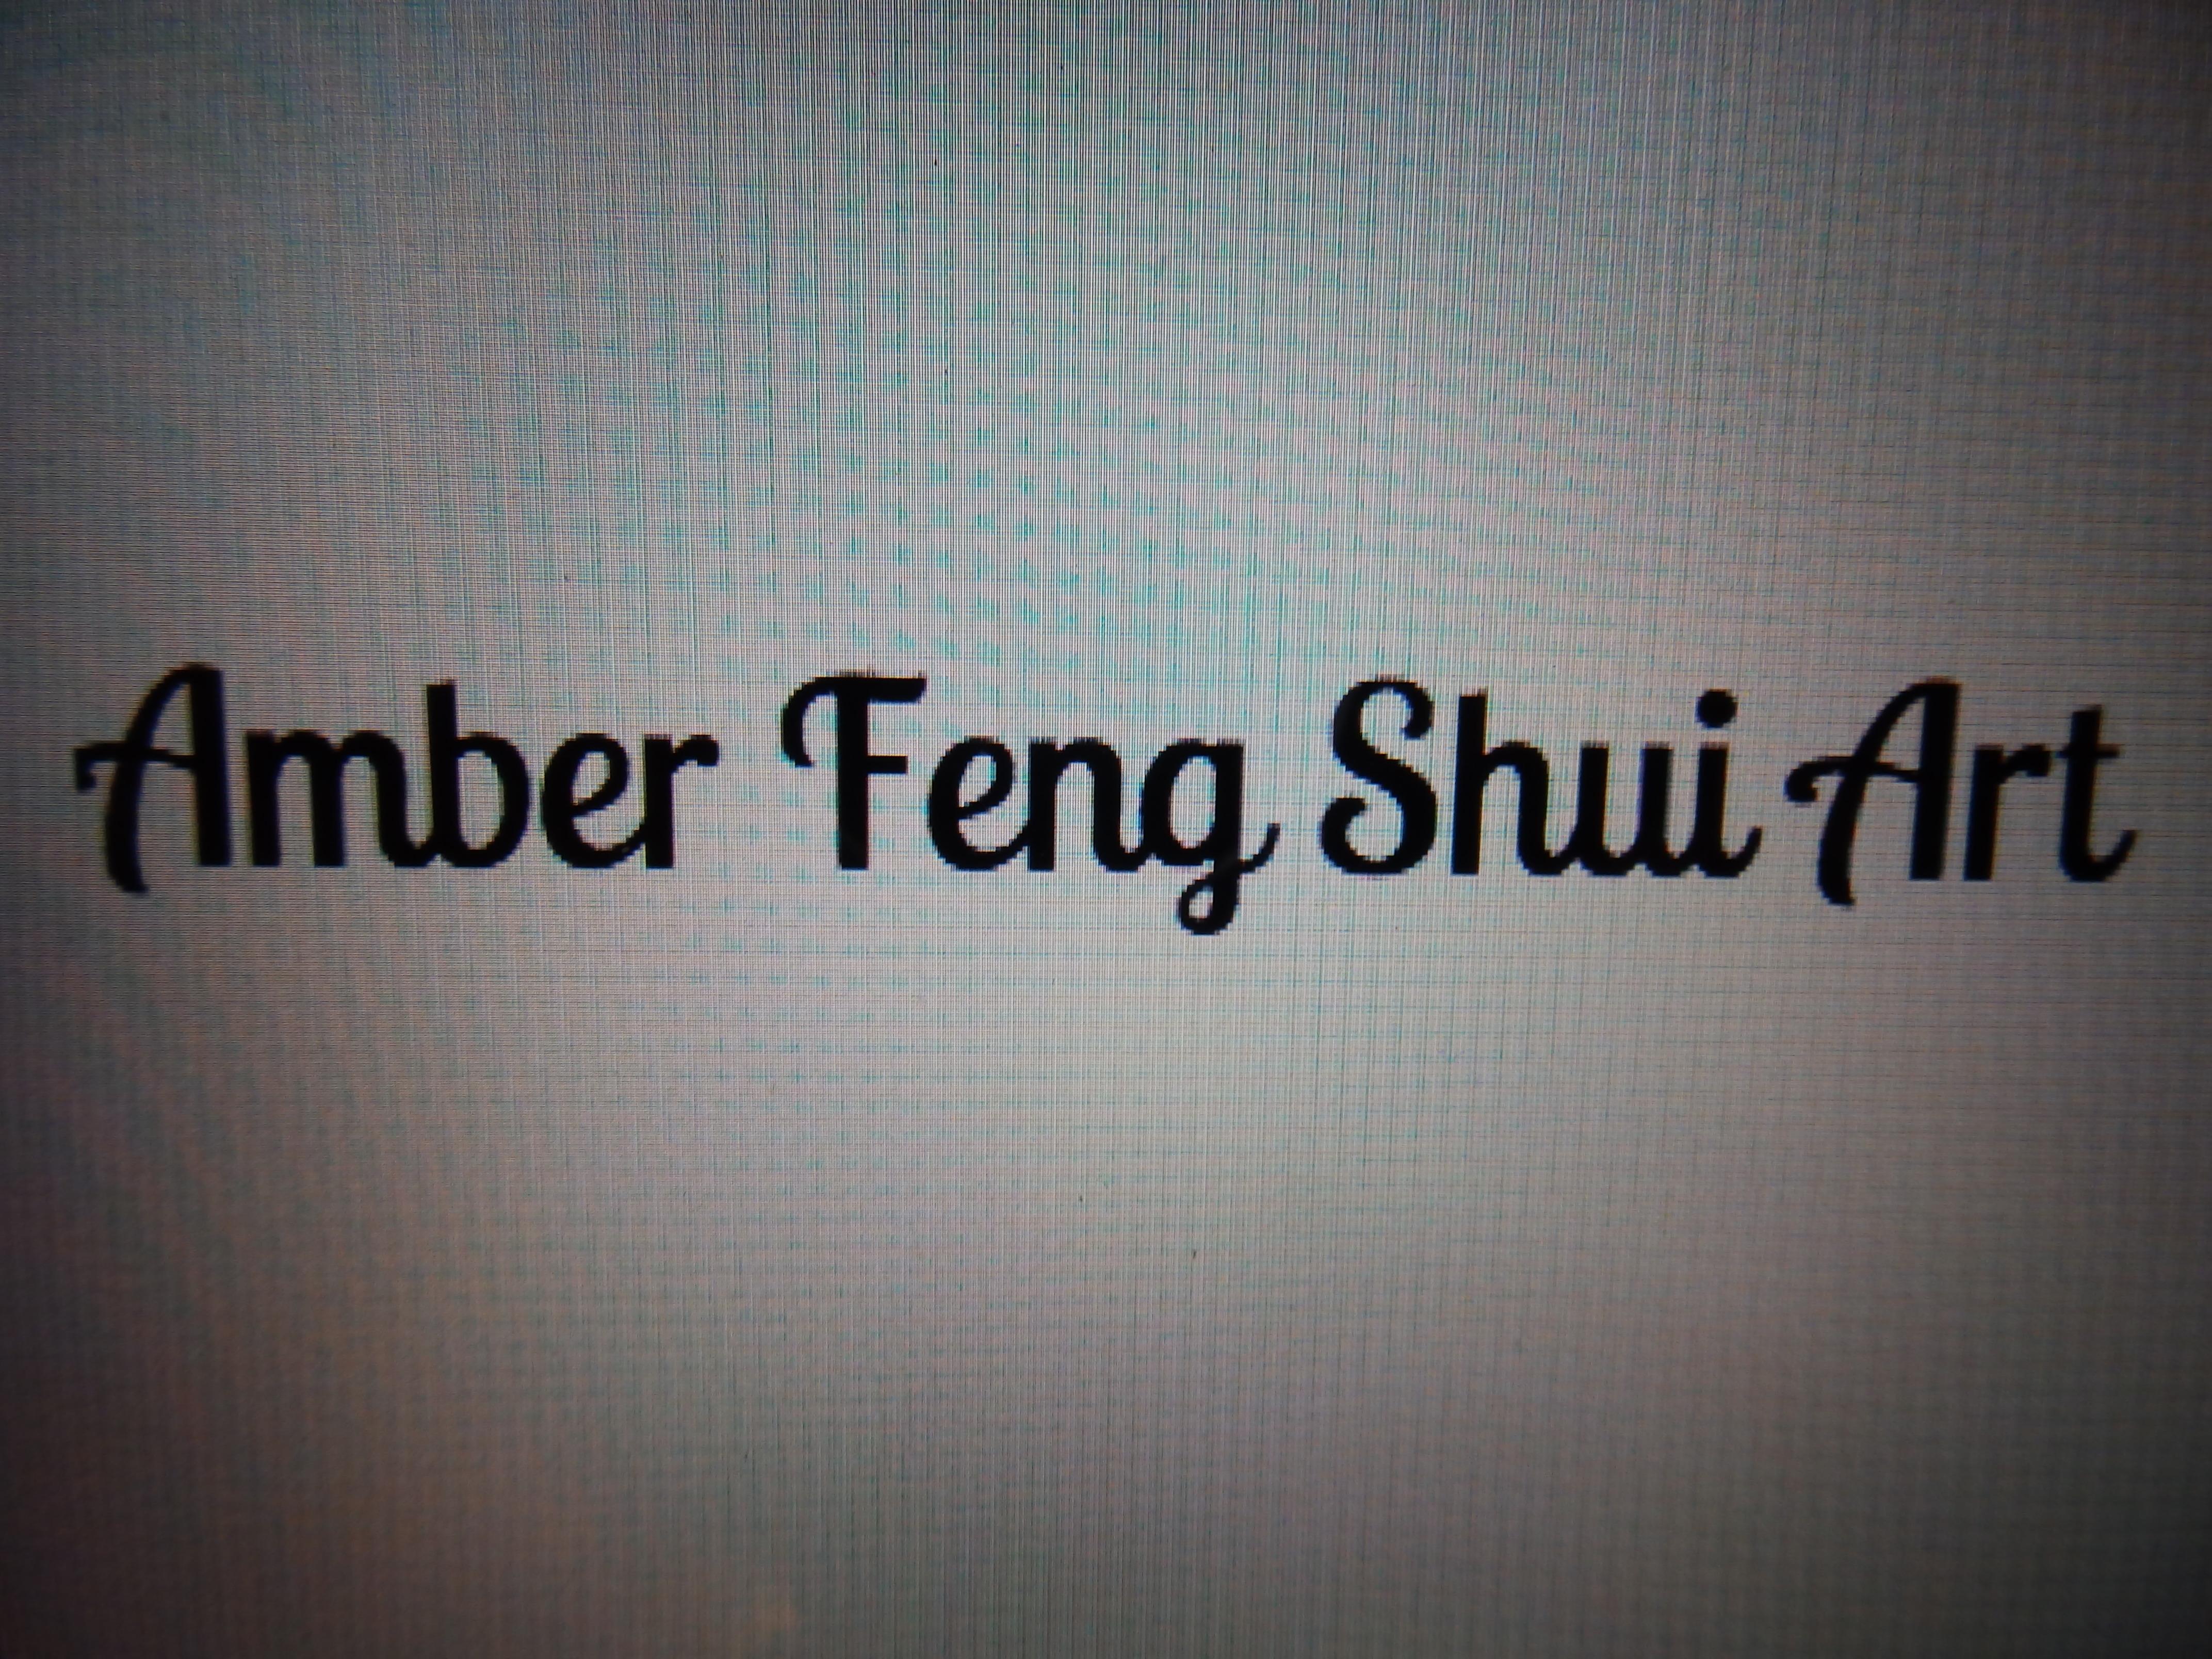 Amber Feng Shui Art's Signature